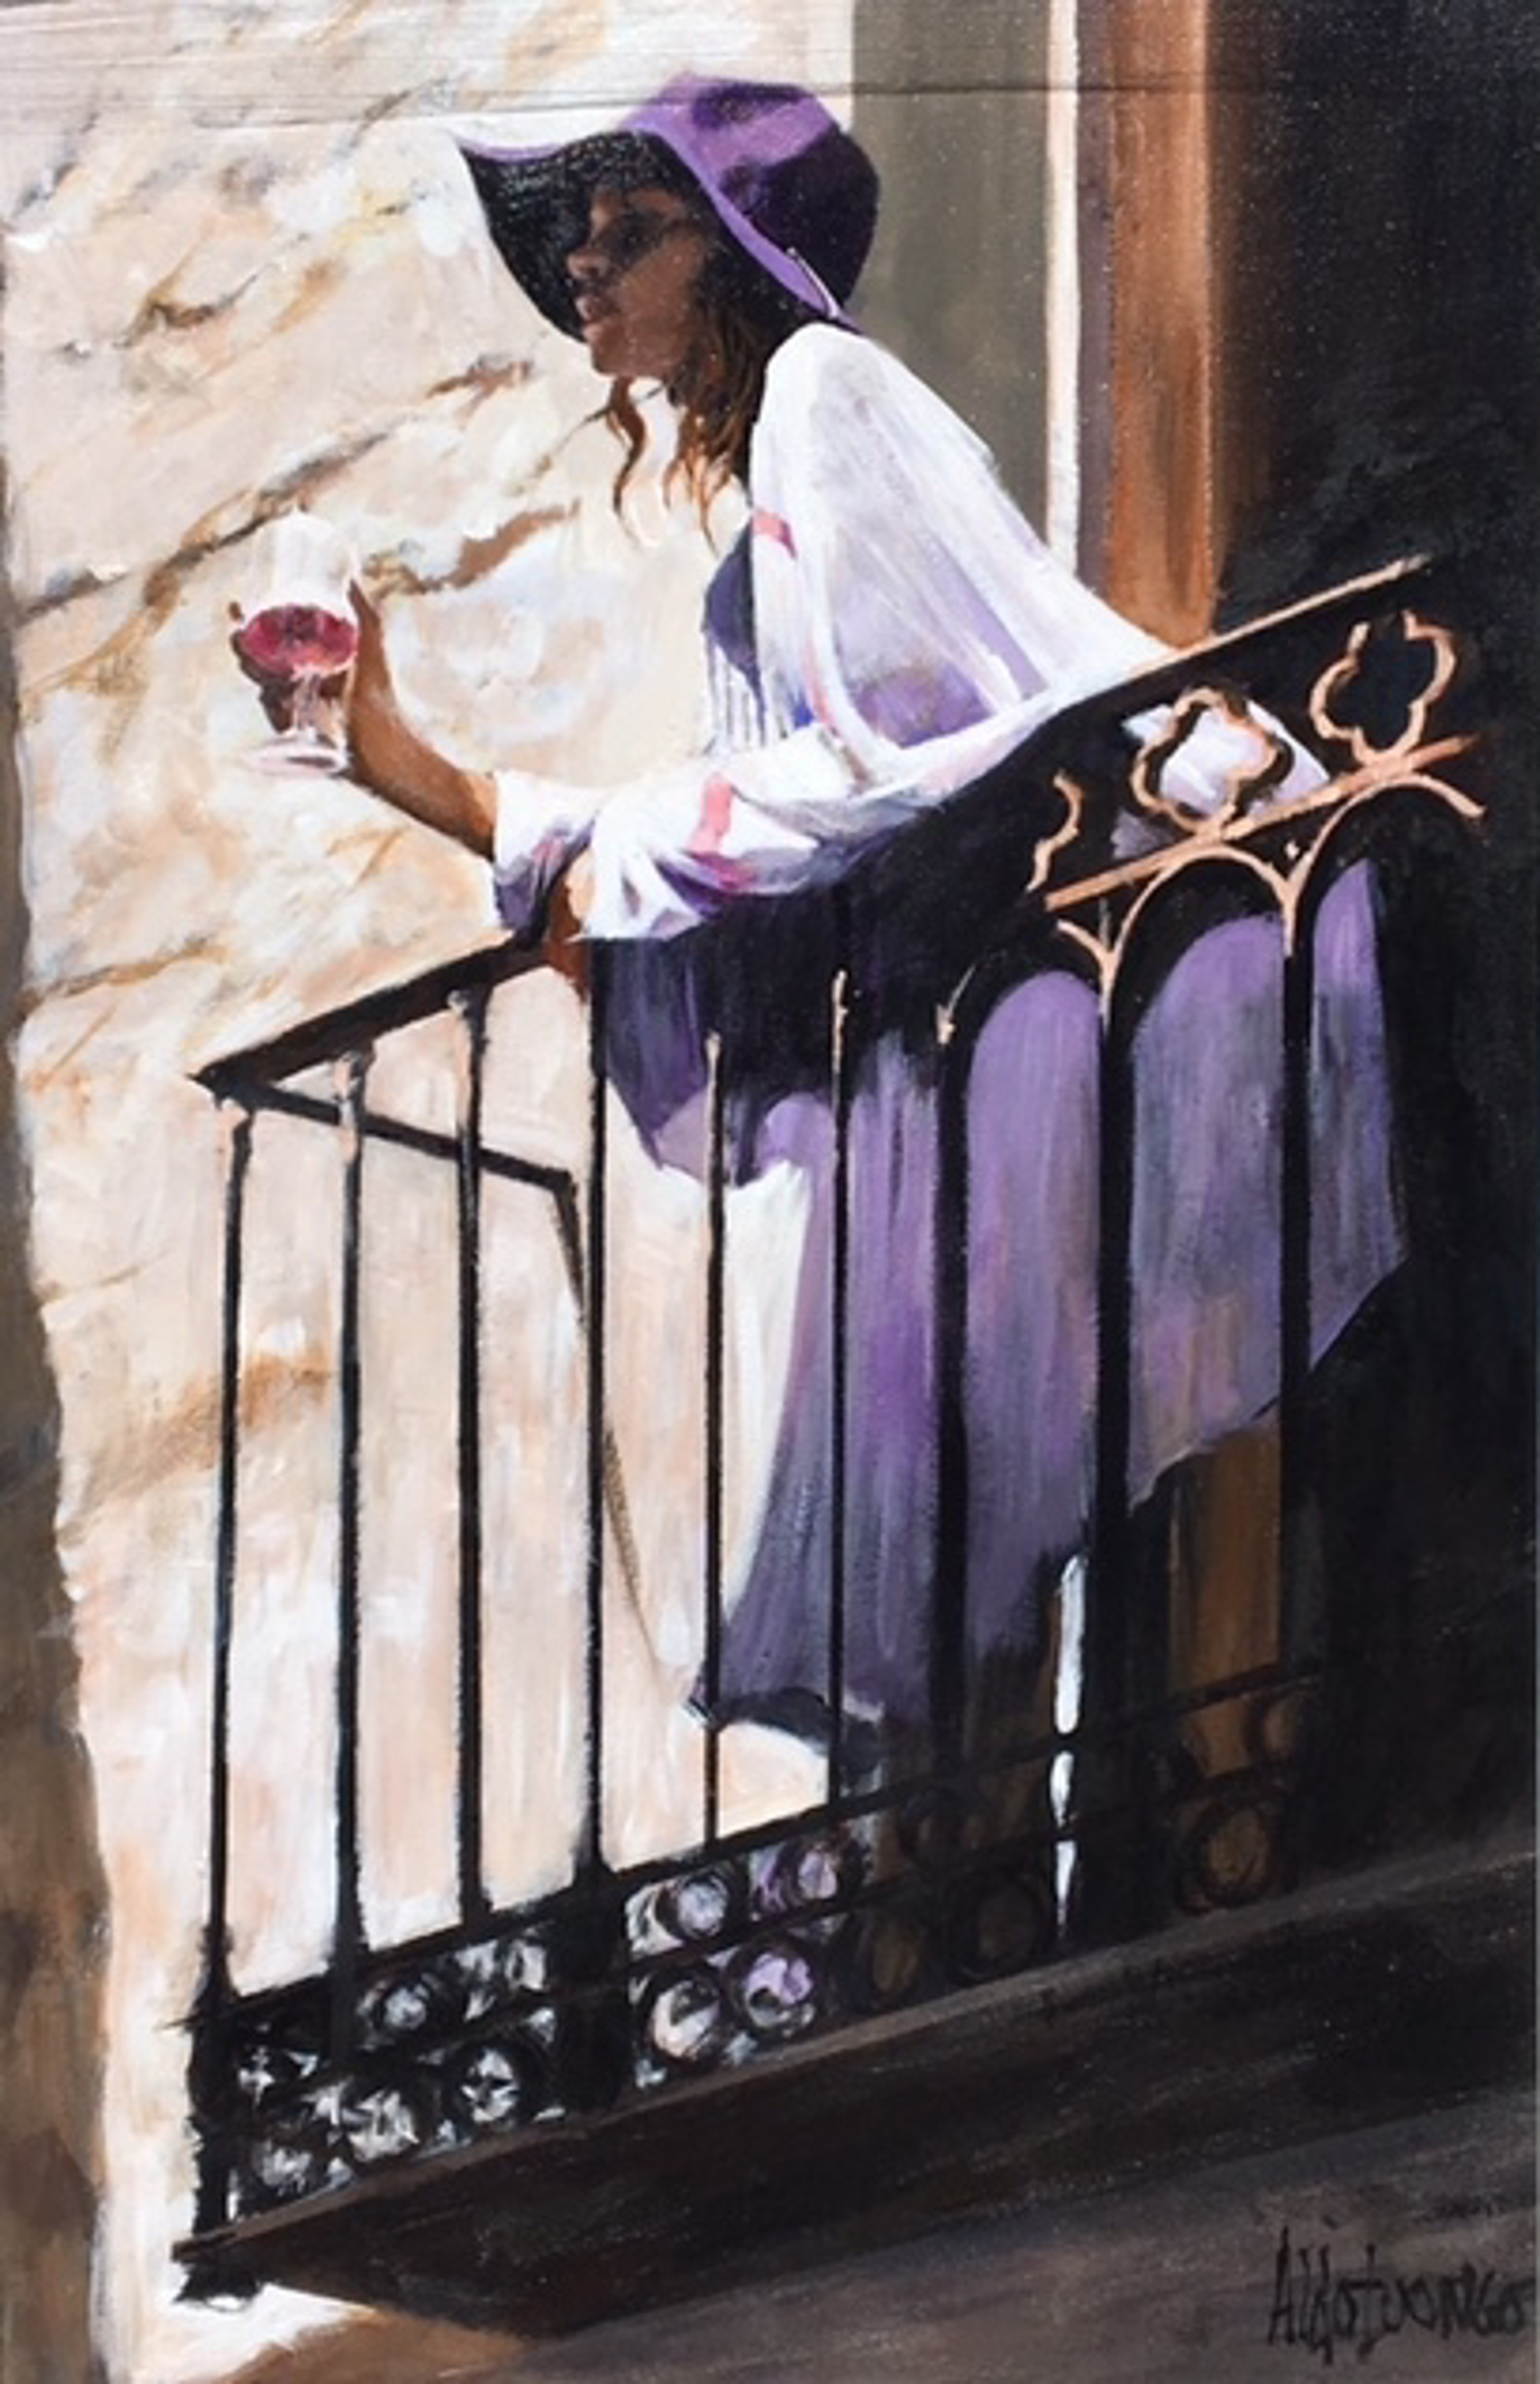 Peering at the Balcony by Aldo Luongo